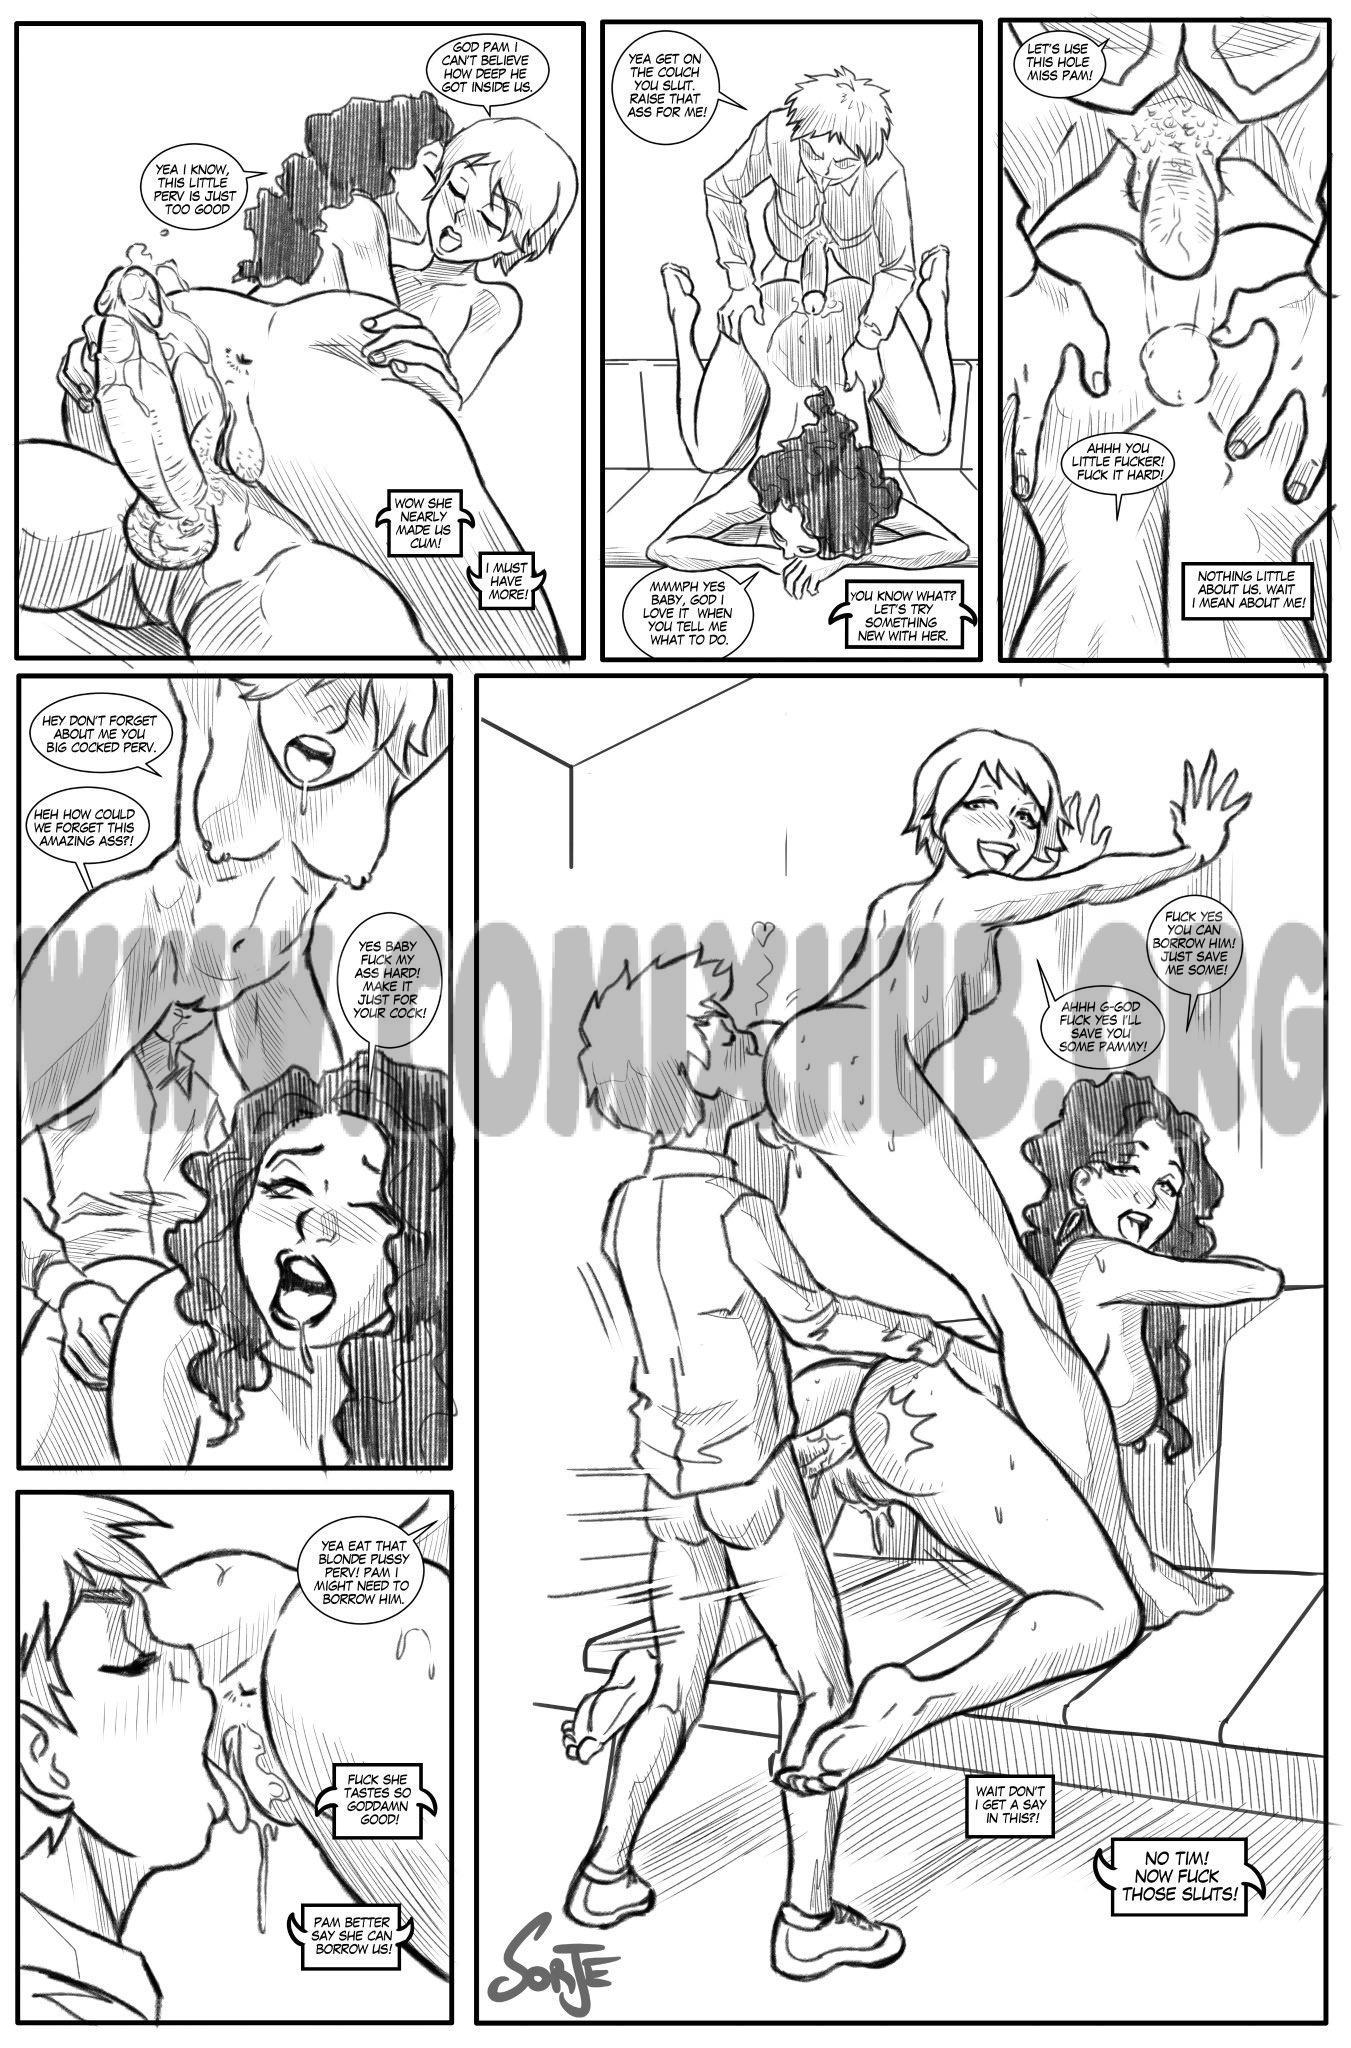 Sidney: Fast Times R&R High porn comics Oral sex, Anal Sex, Blowjob, Creampie, cunnilingus, fingering, Masturbation, Straight, Straight Shota, Threesome